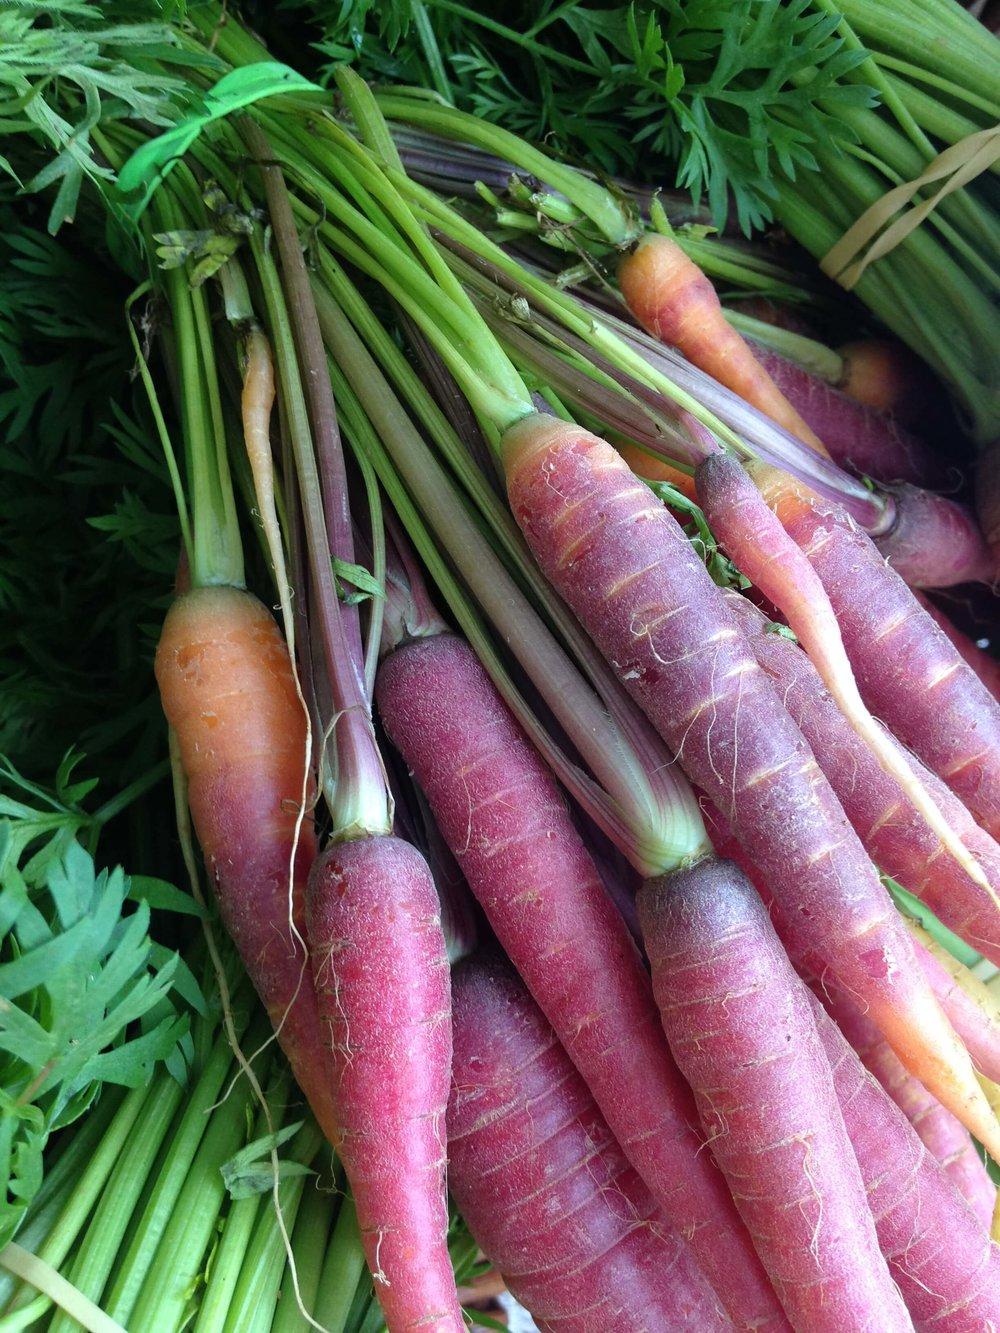 purple carrots at farmers market Ellensburg, WA